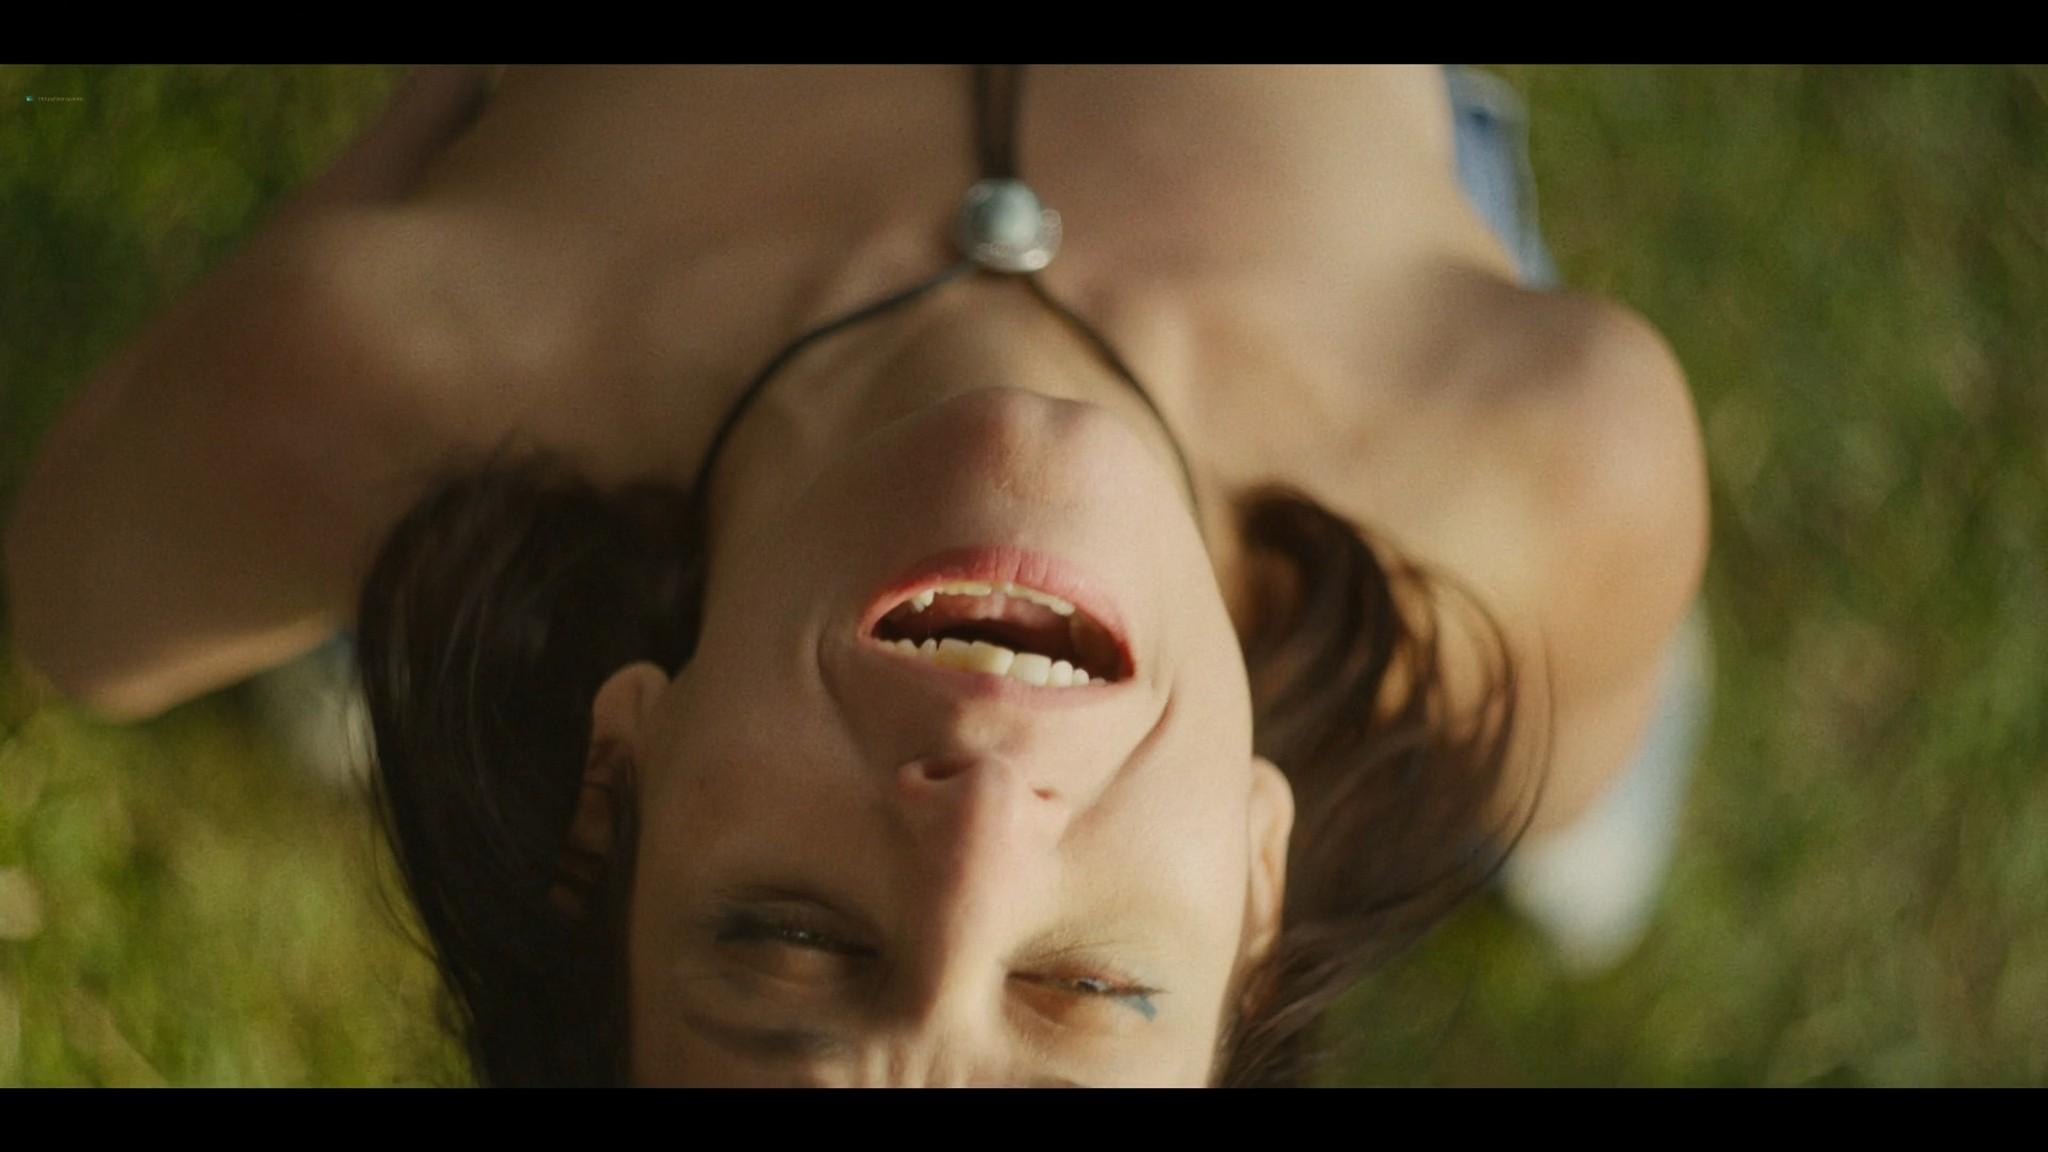 Natalia Lage nude sex Brunna Martins Juliana Bebe and oters nude too Hard 2021 s2e4 6 1080p Web 9